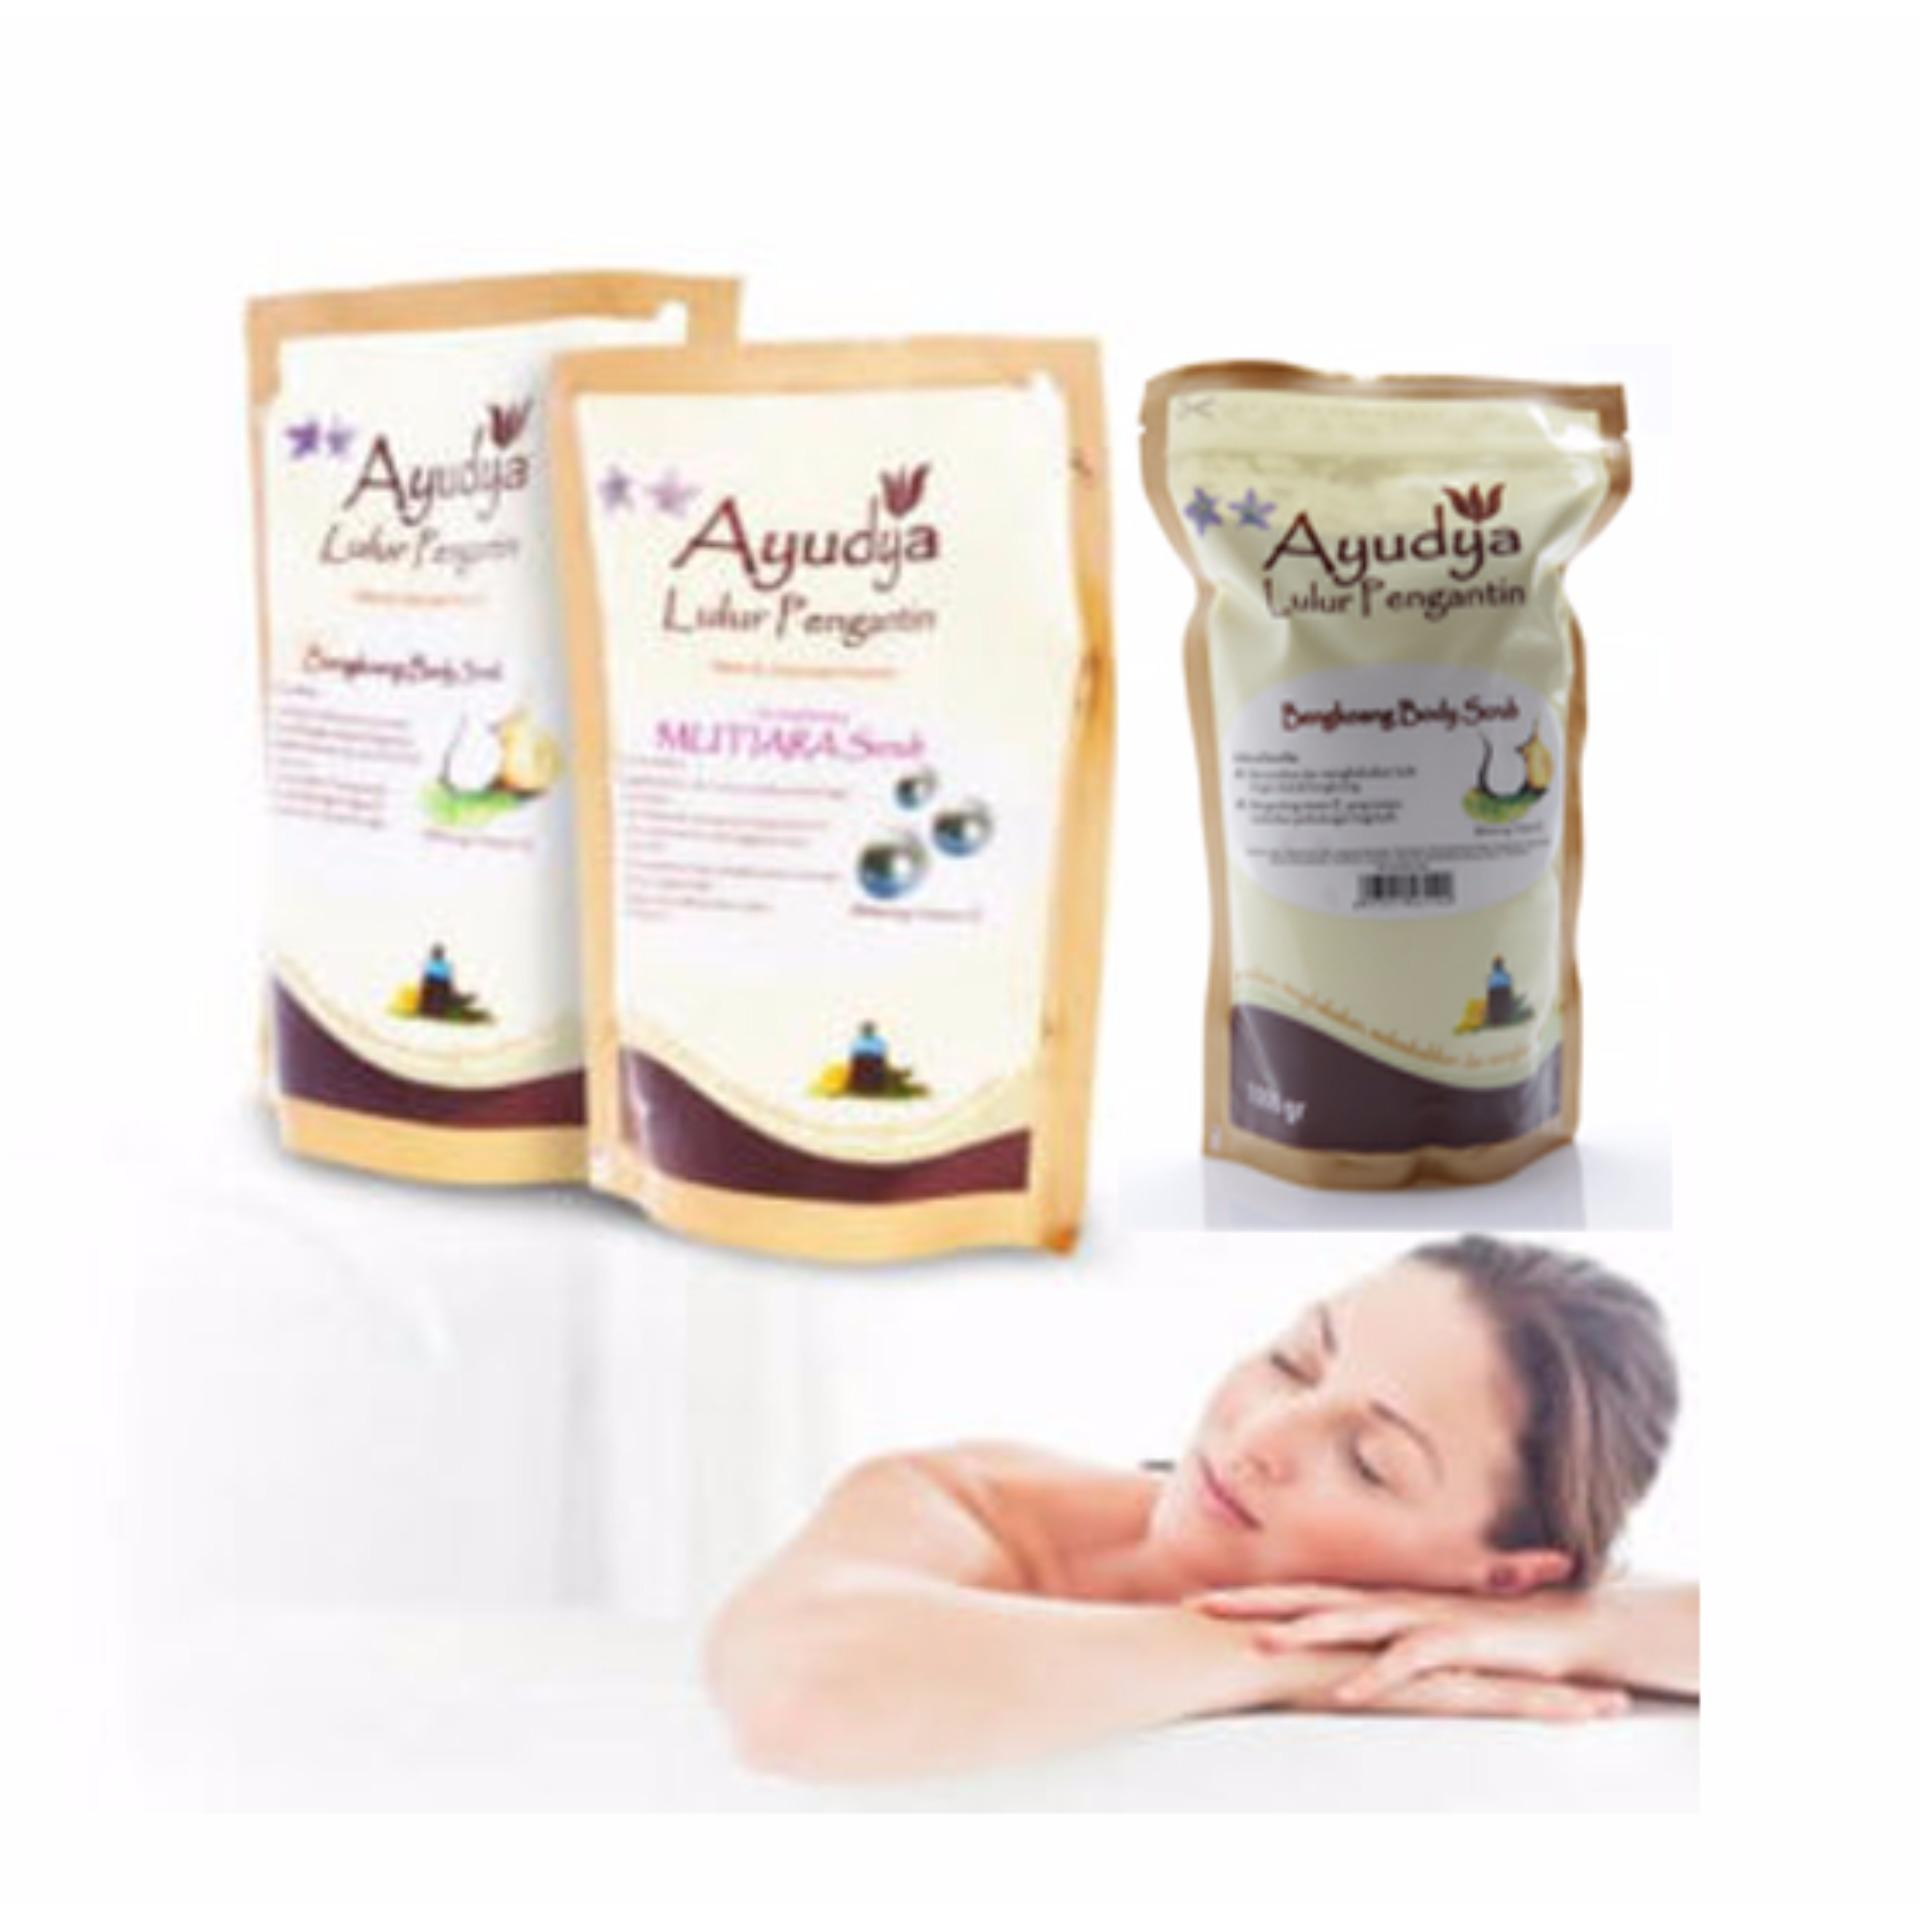 Ayudya Lulur Pengantin Herbal Spa Refill 300 Gr Daftar Harga Mas Sinangling Rm 25 300gr 1pcs Kemasan Reffil